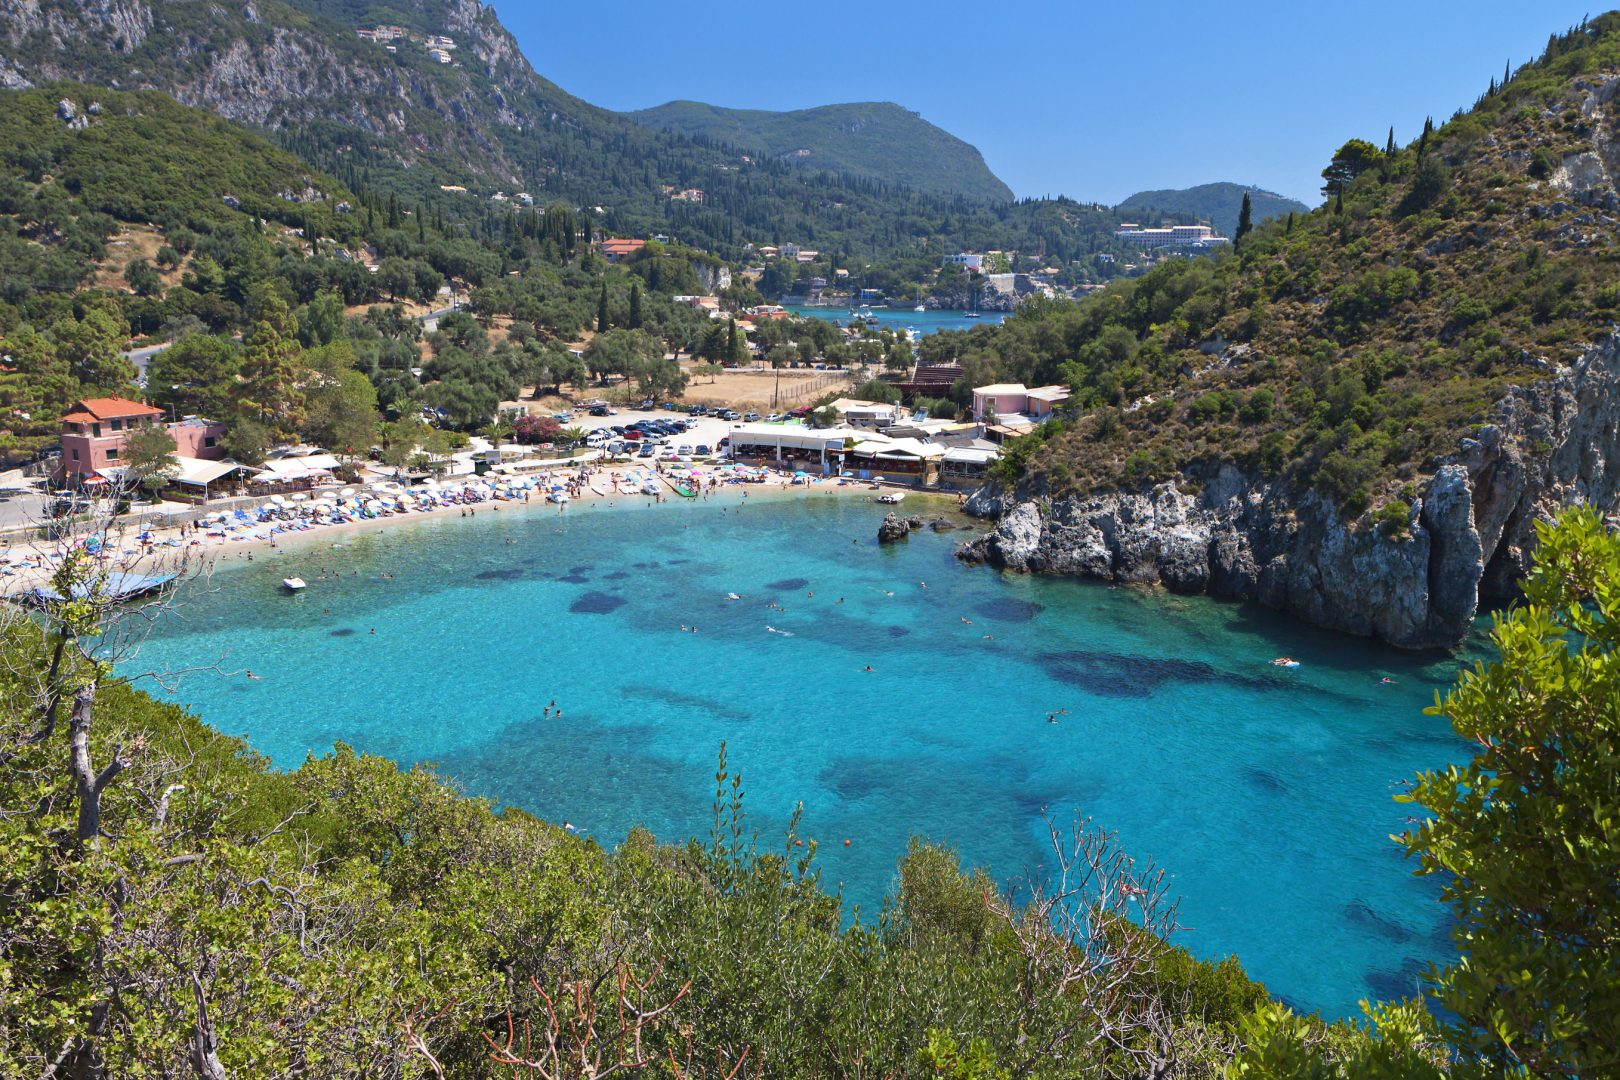 Palaiokastritsa beach at Corfu island in Greece